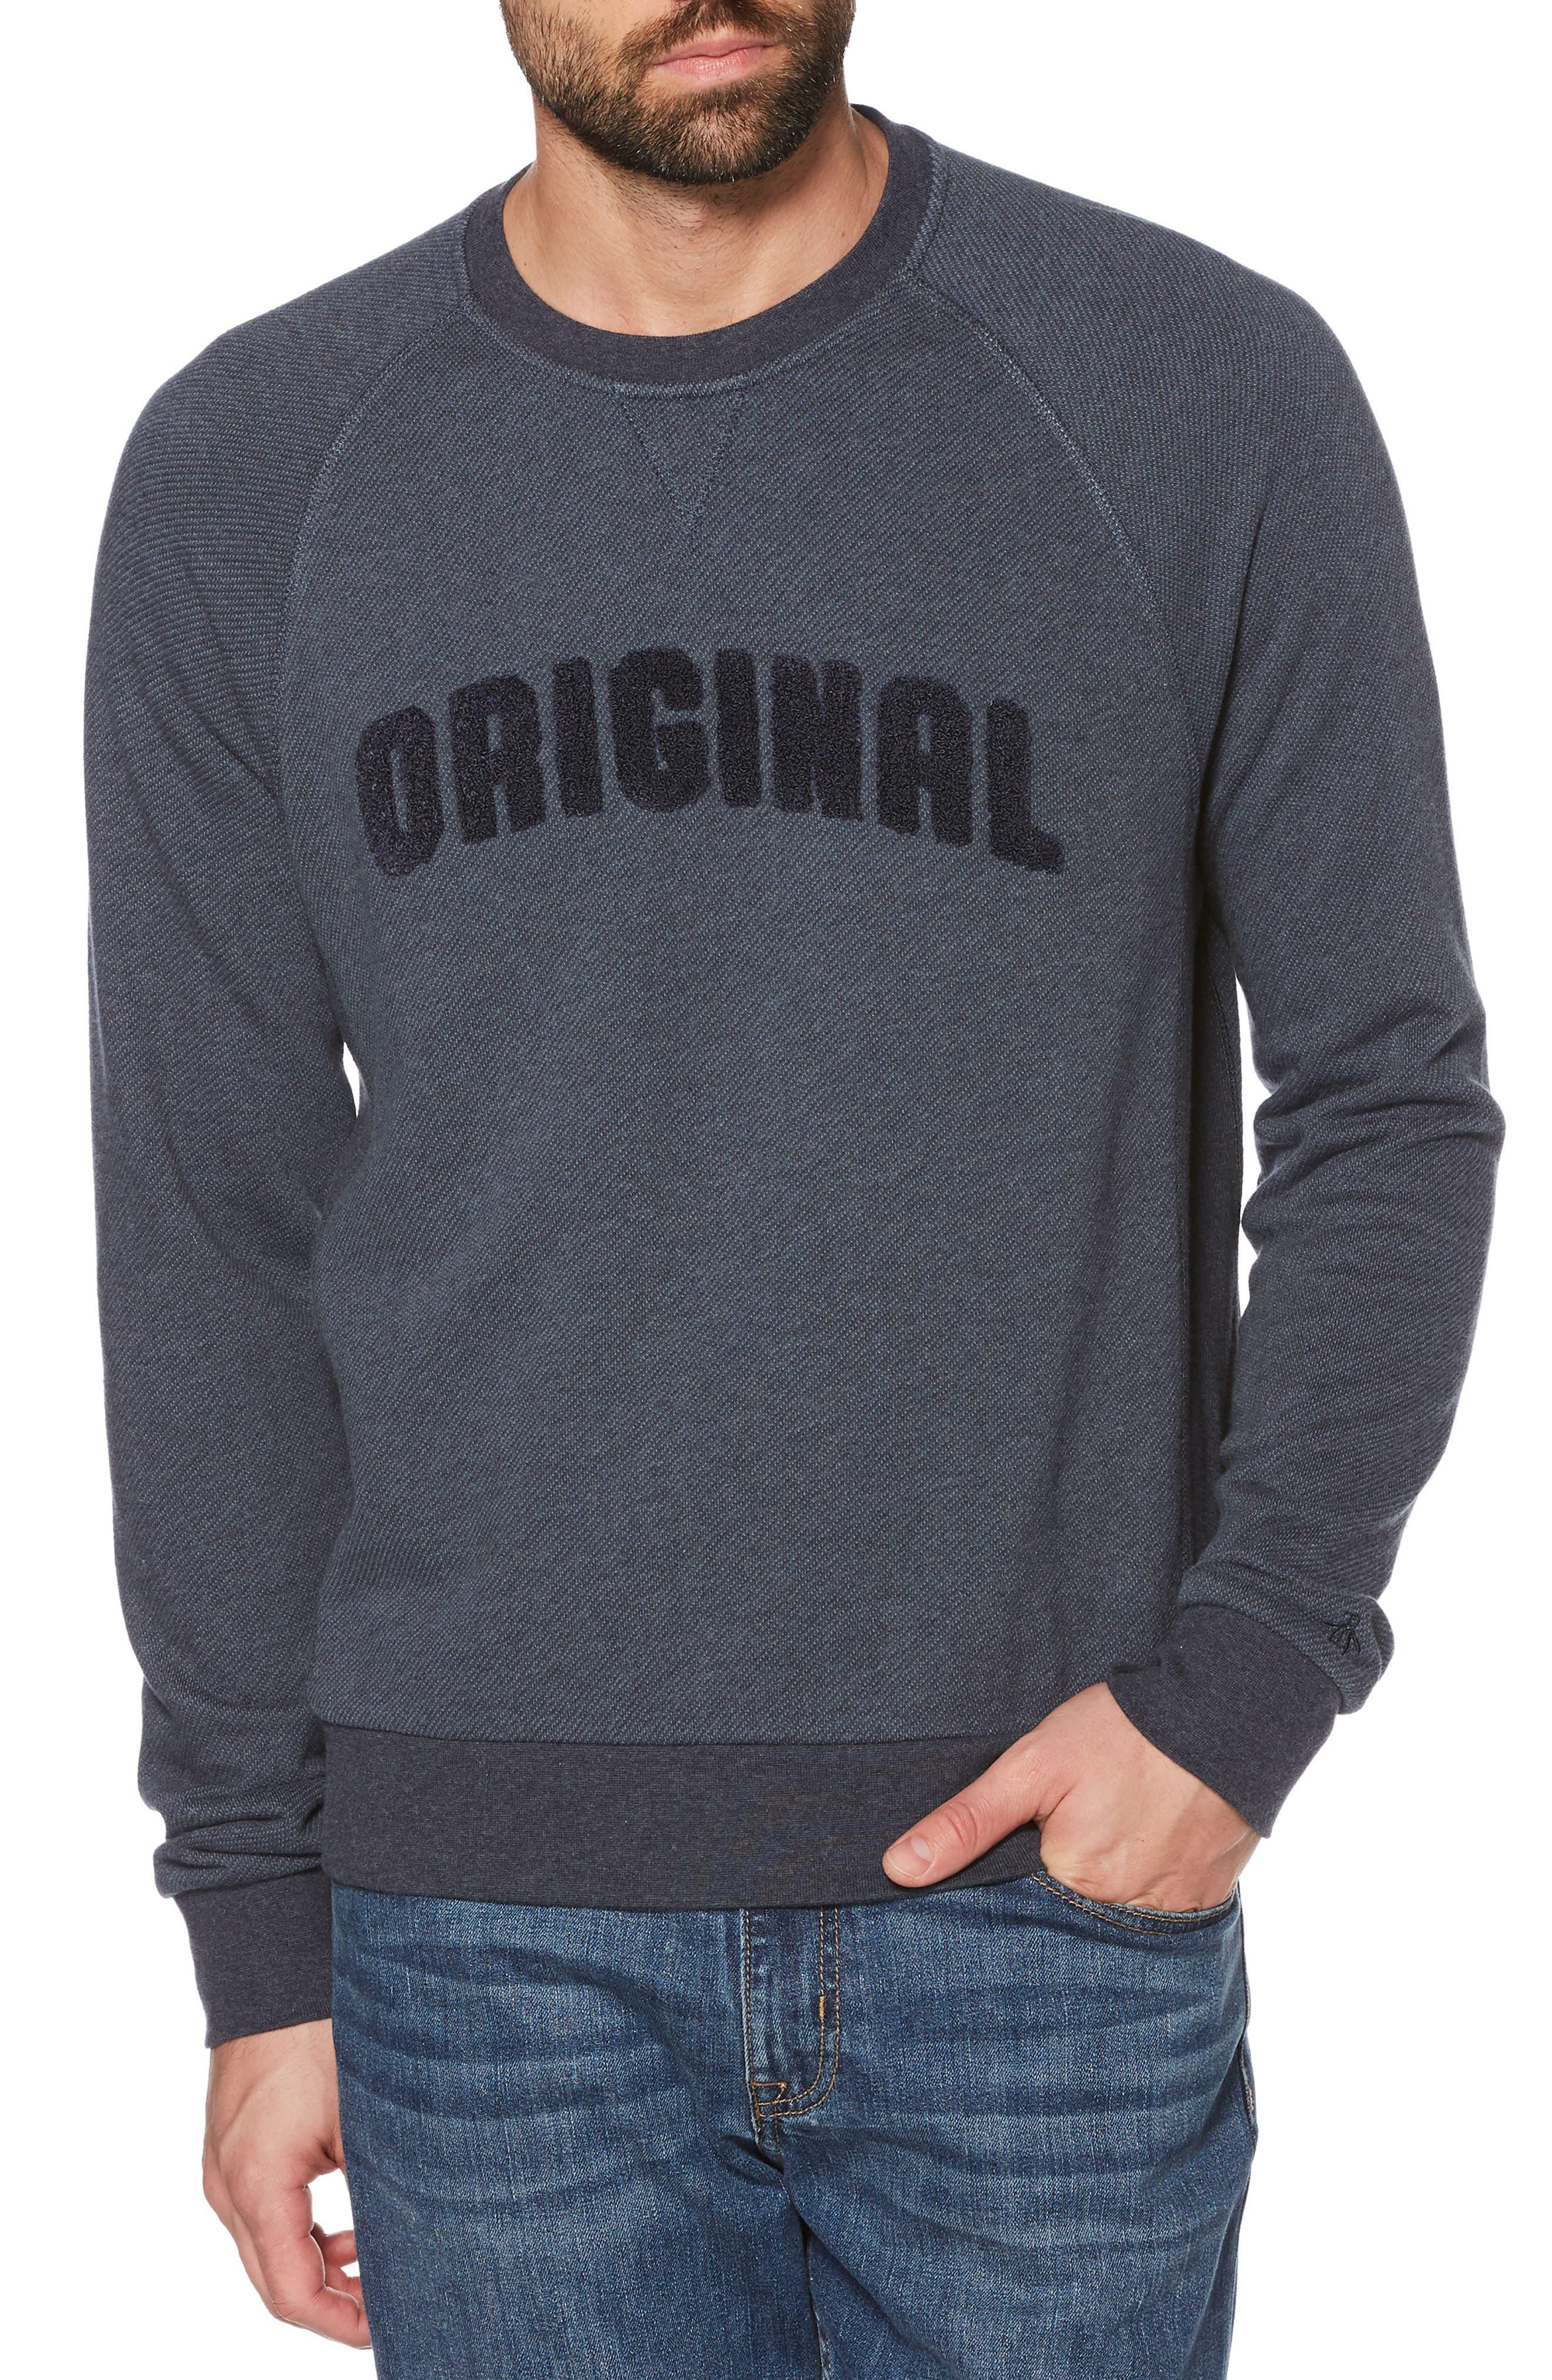 Main Image - Original Penguin Bouclé Sweatshirt